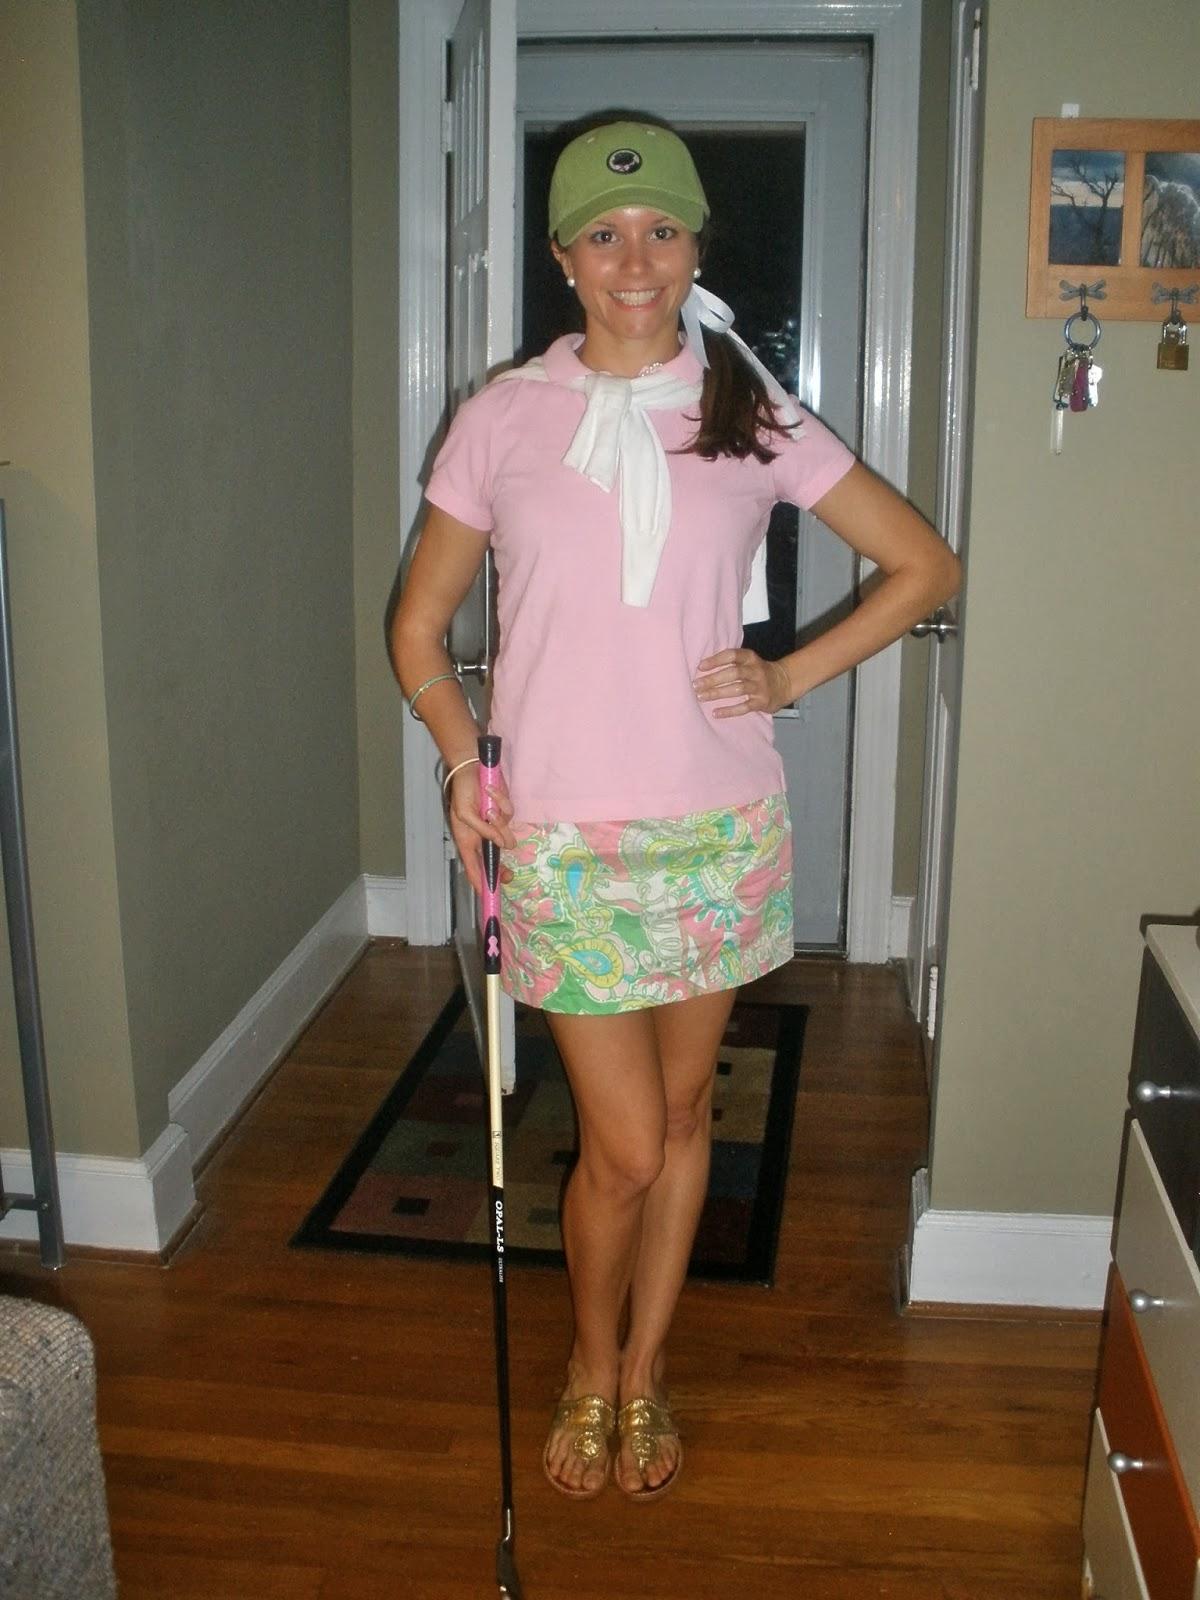 Golfer Halloween Costume